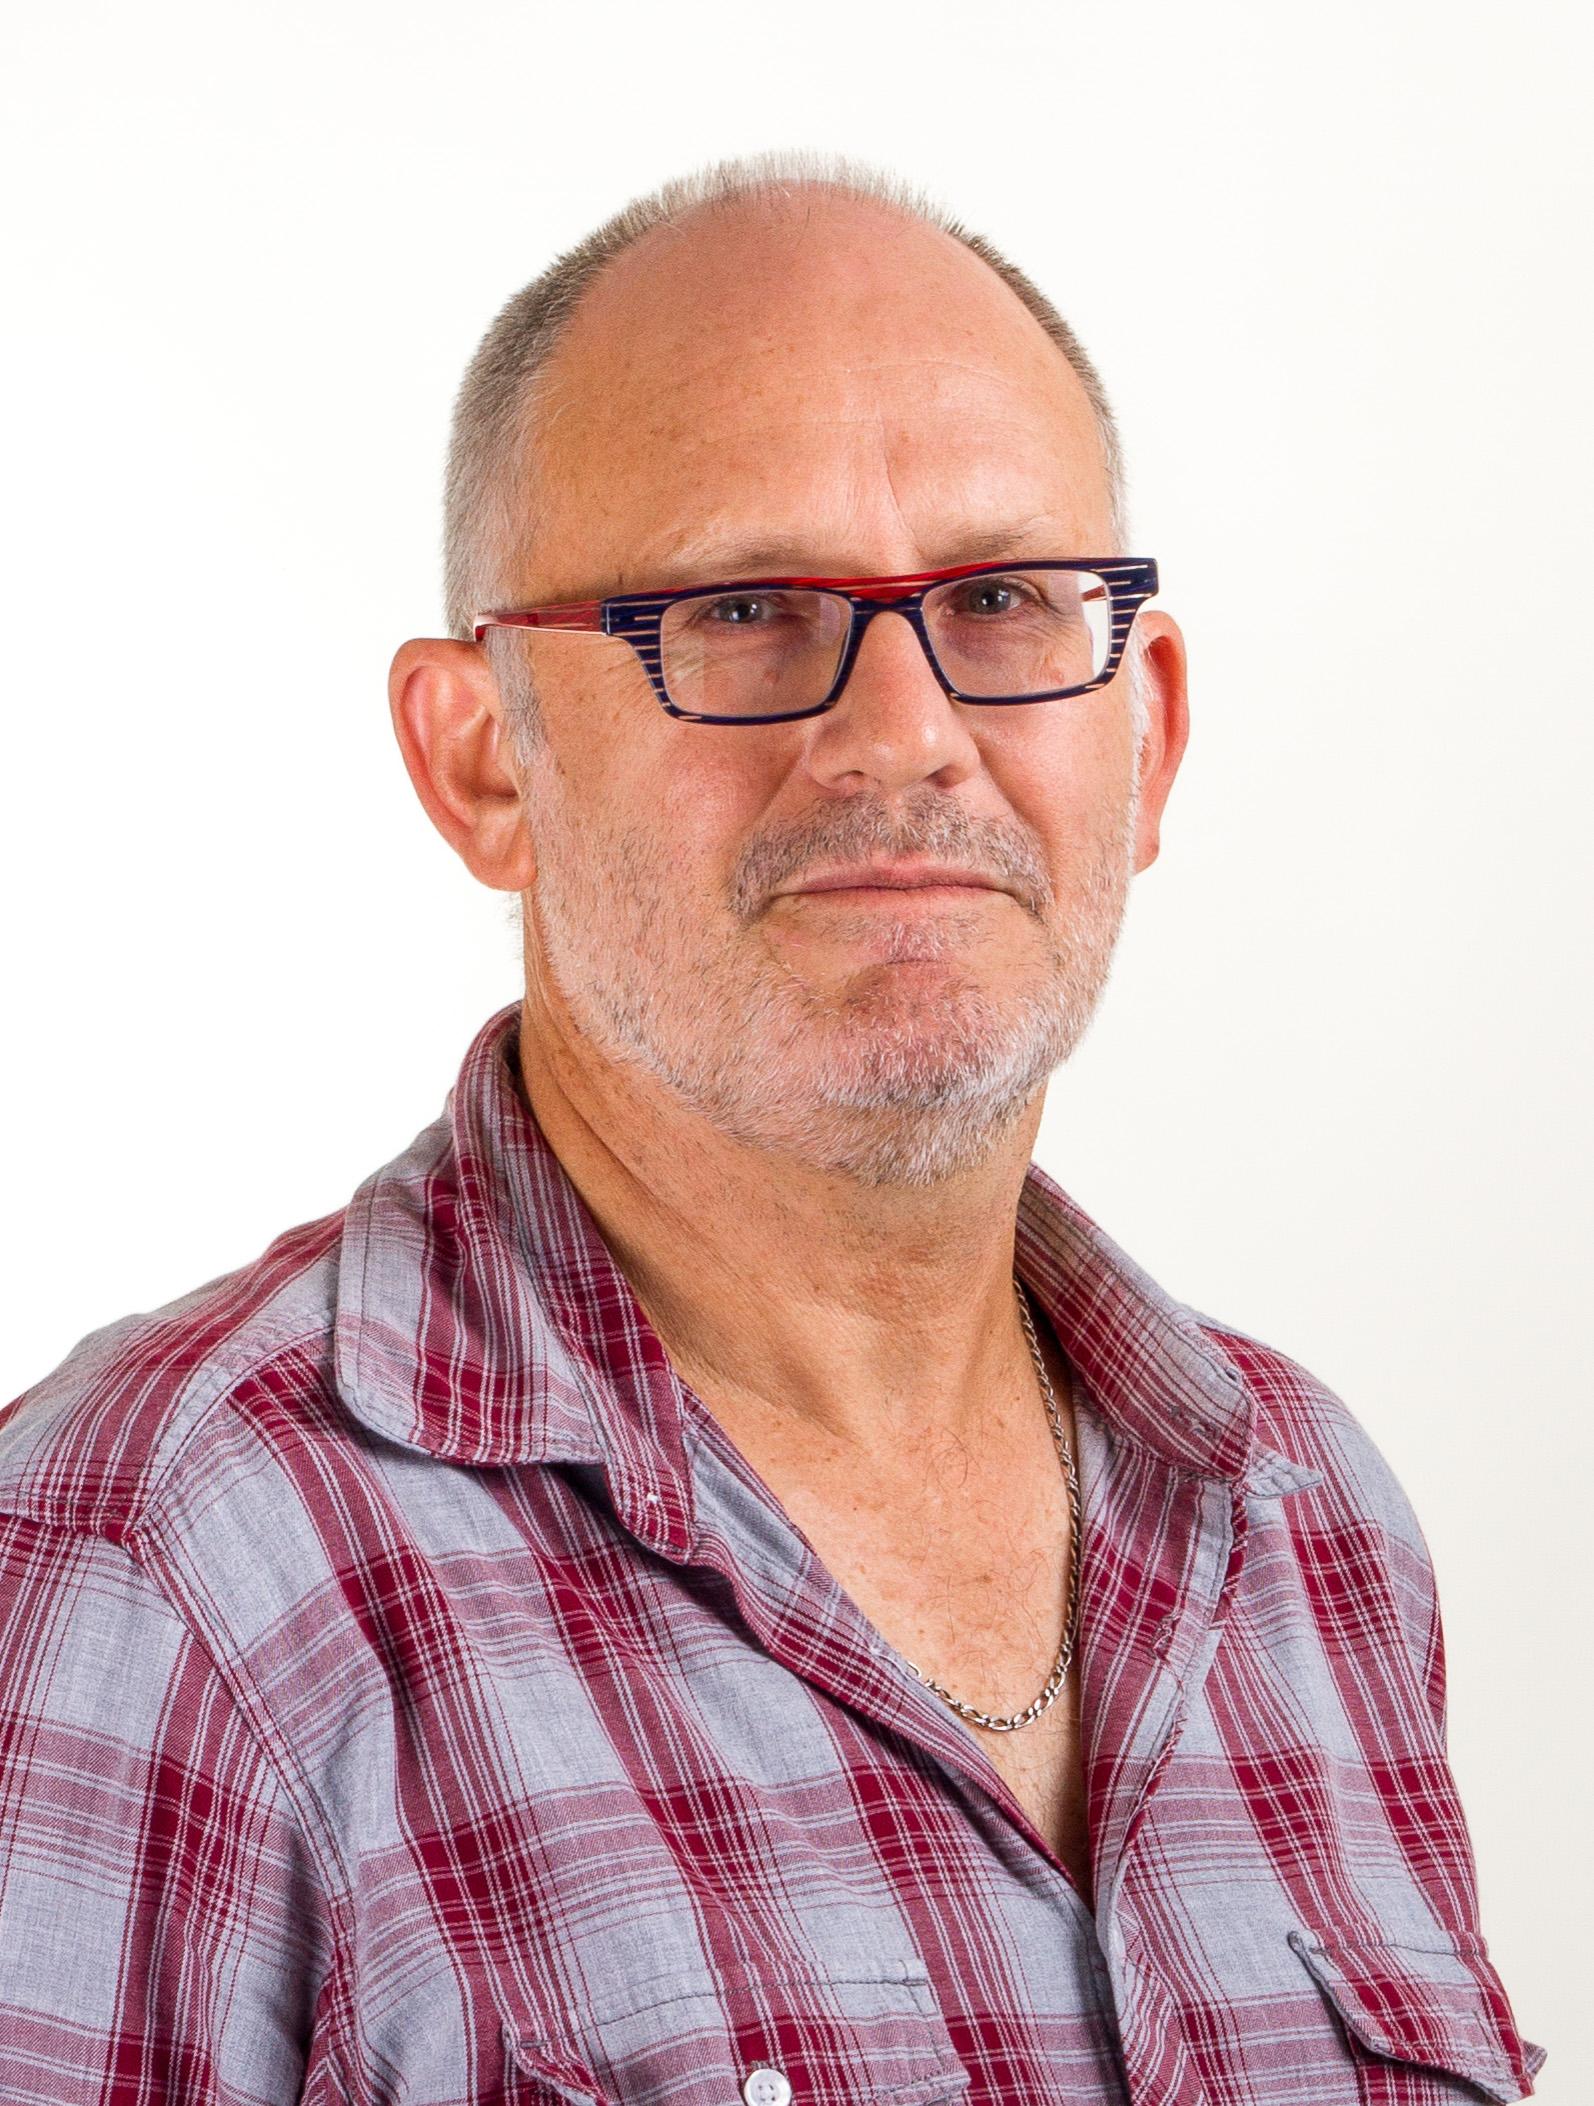 Dave Tout